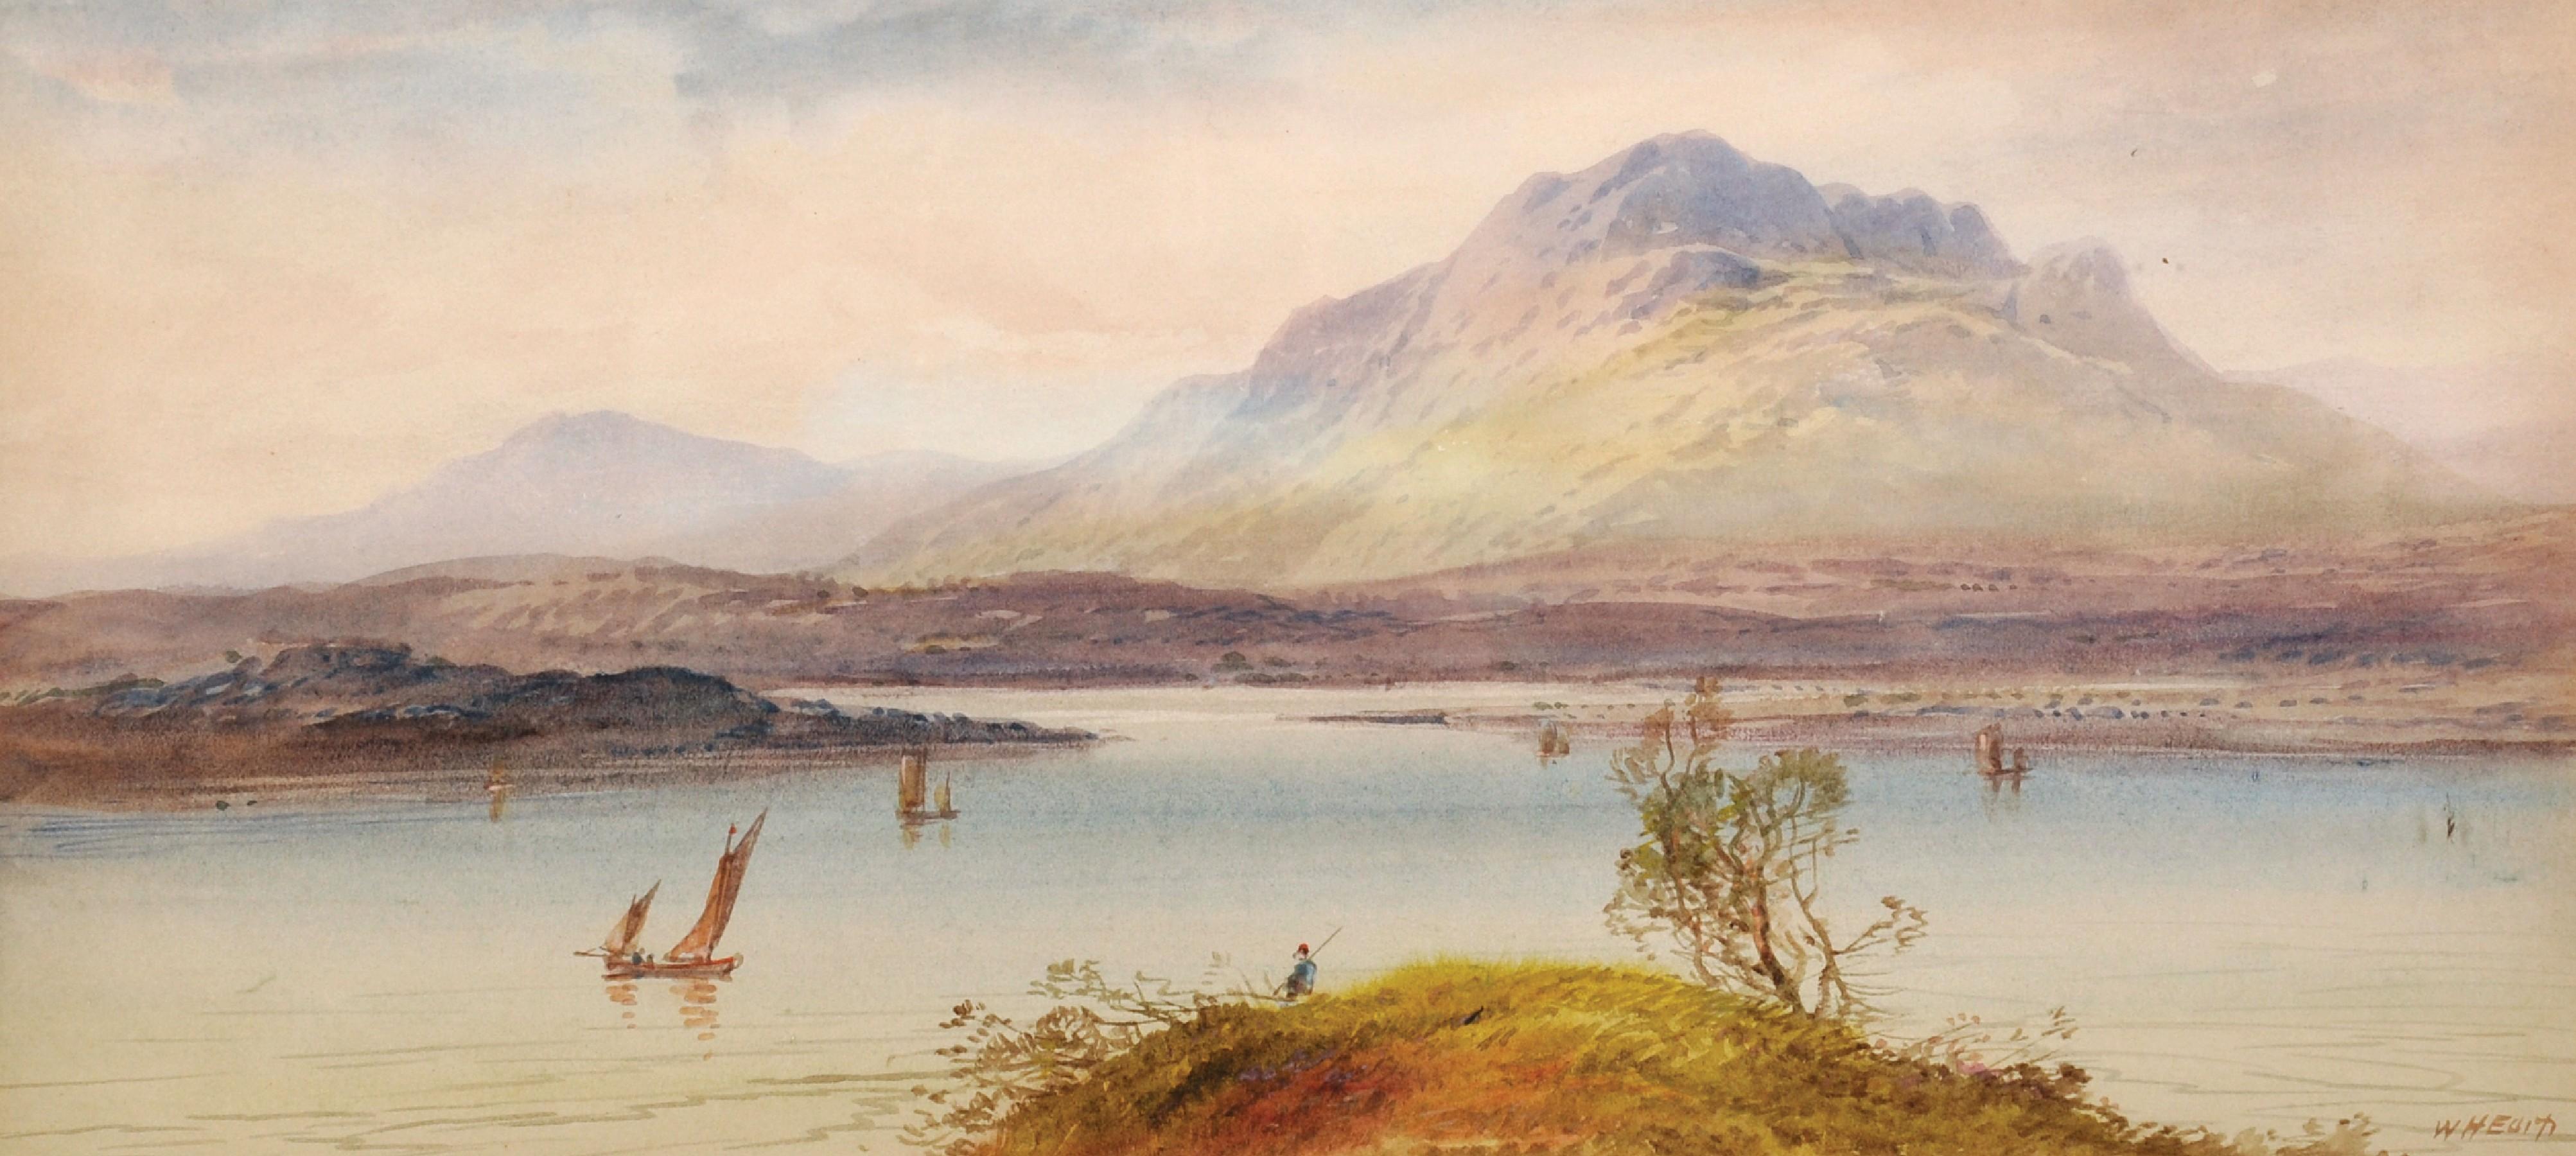 "William Henry Earp (1833- ) British. A Mountainous River Landscape, Watercolour, Signed, 10"" x 21."